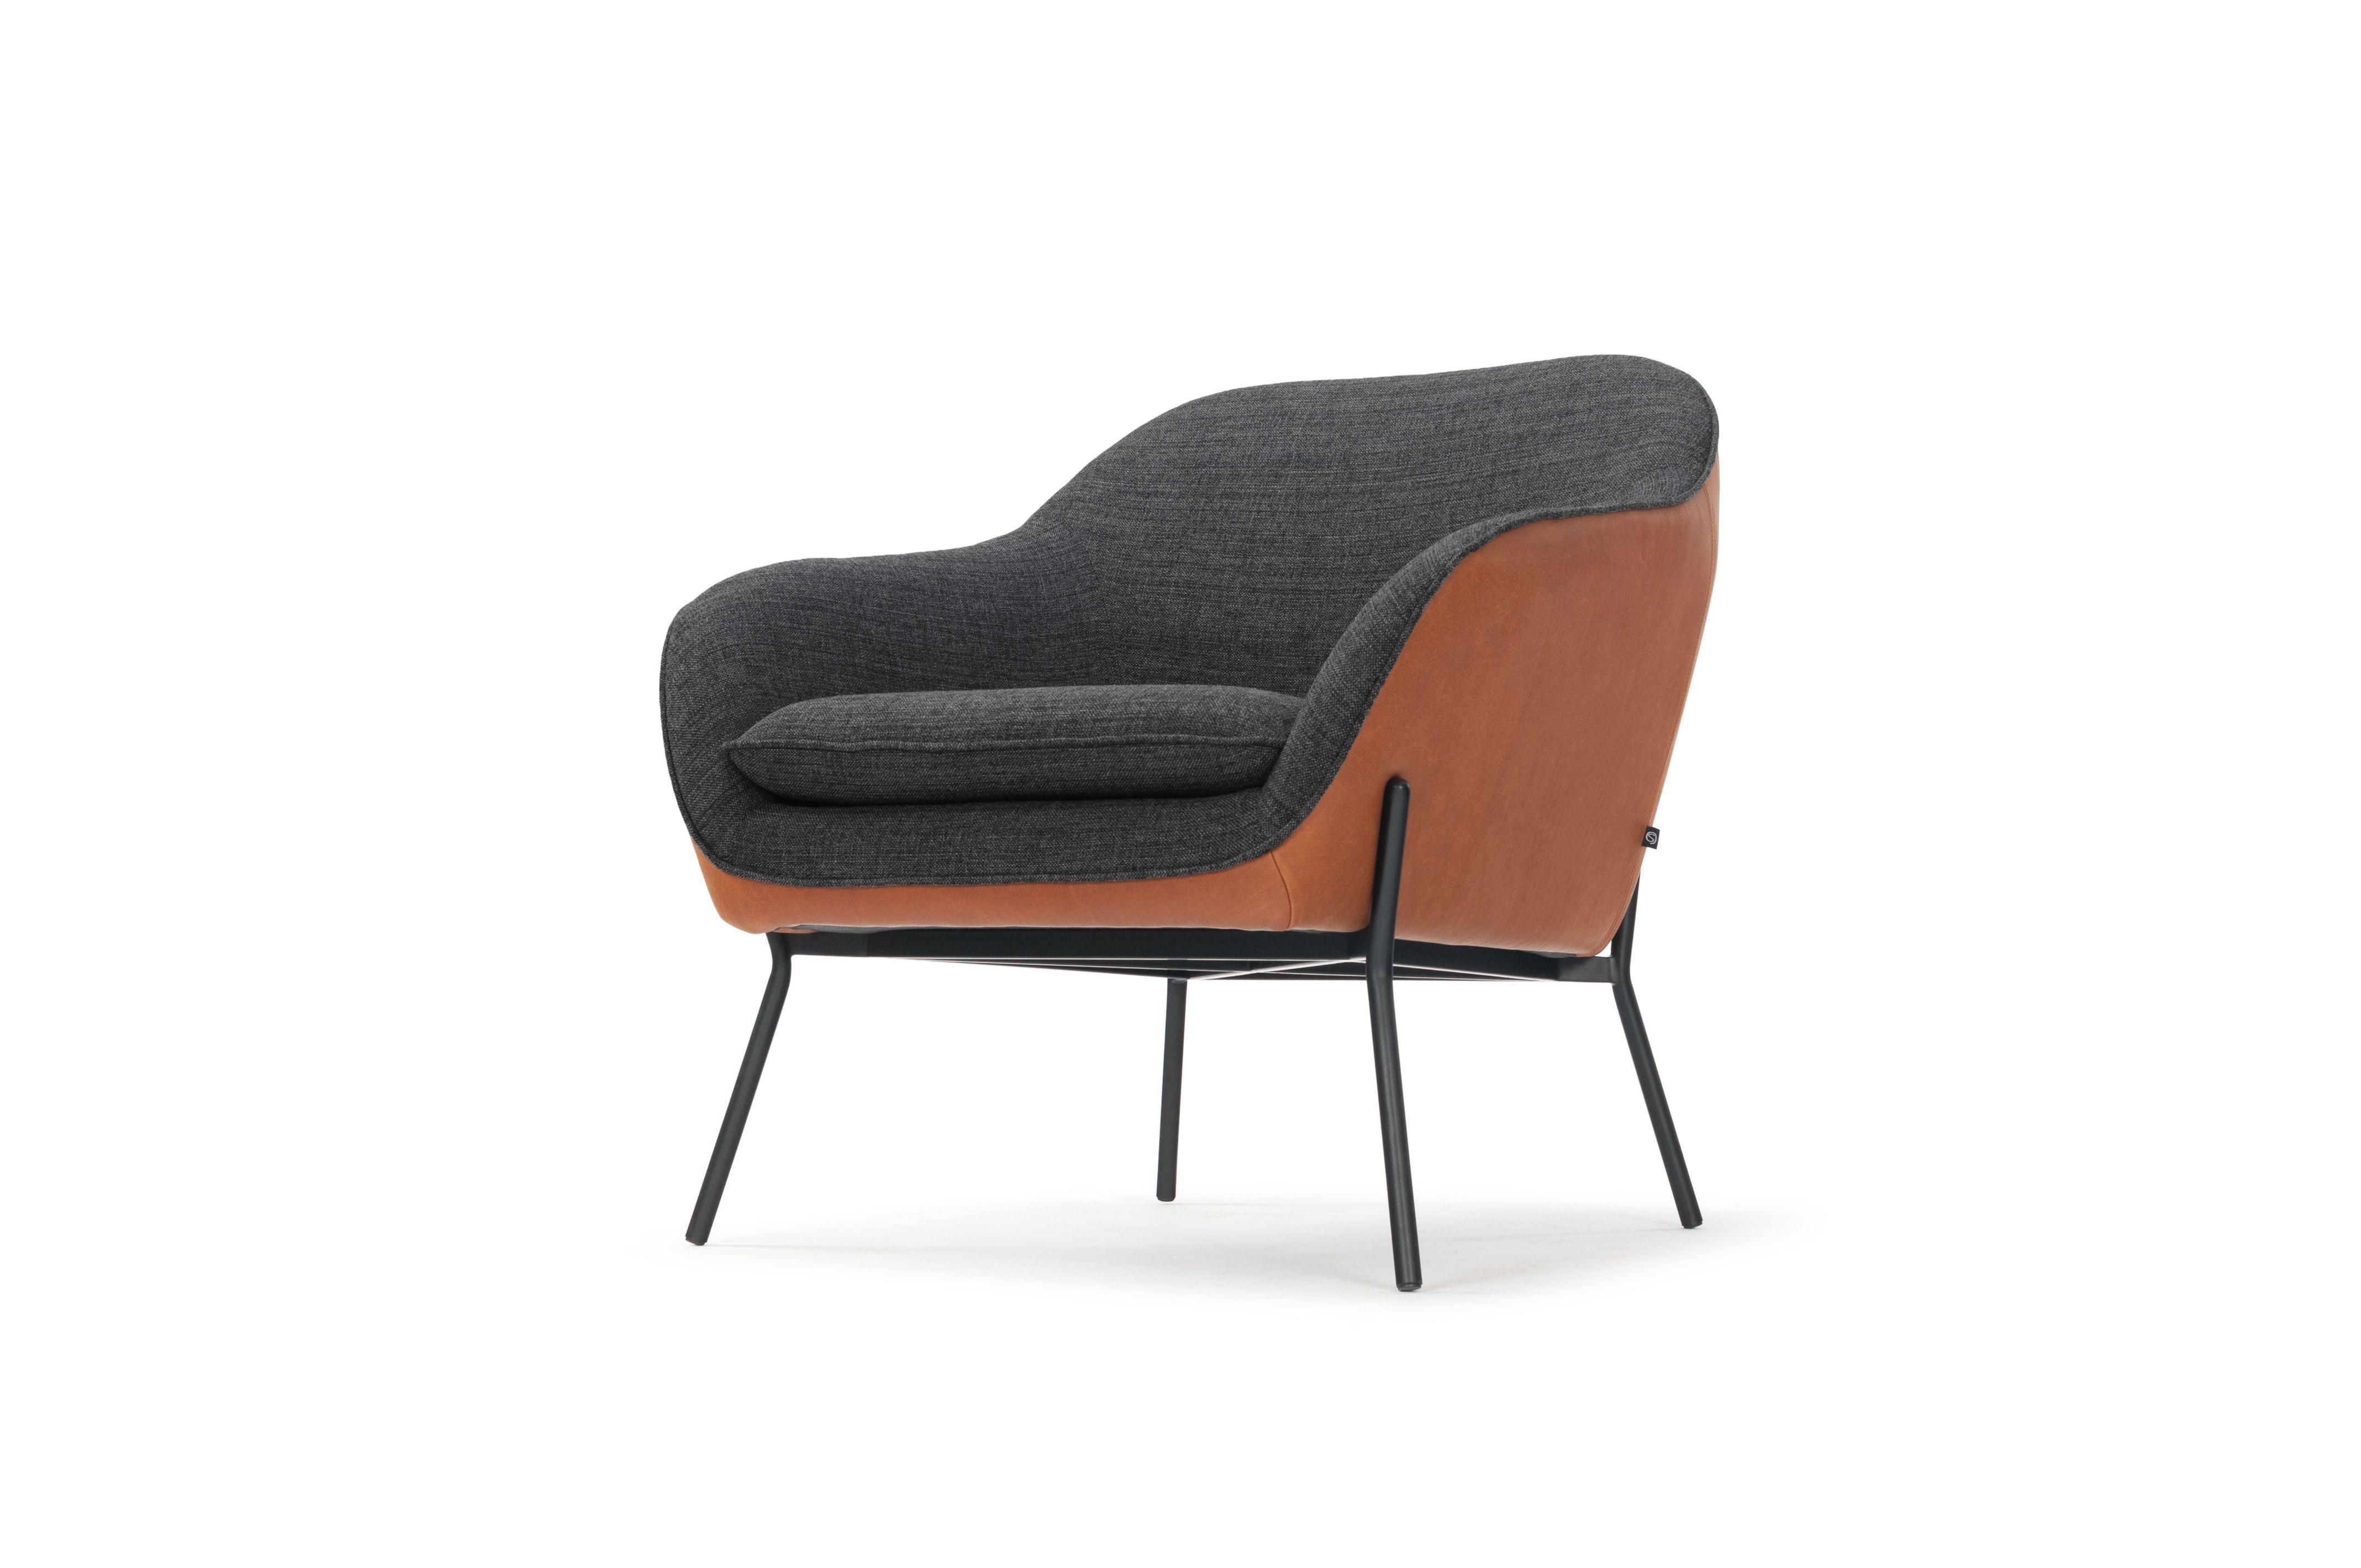 Sonia-https://nl.sofacompany.com/meubels/woonkamer/stoelen/sonia ...